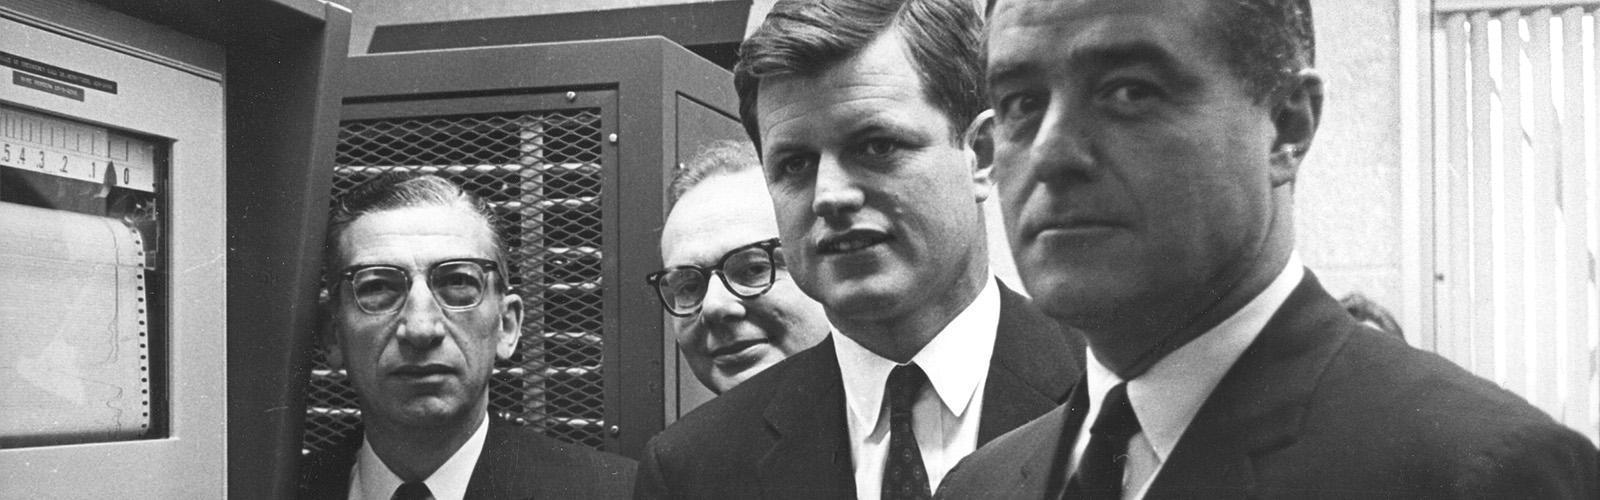 Harry Waisman, Ted Kennedy, Sargent Shriver